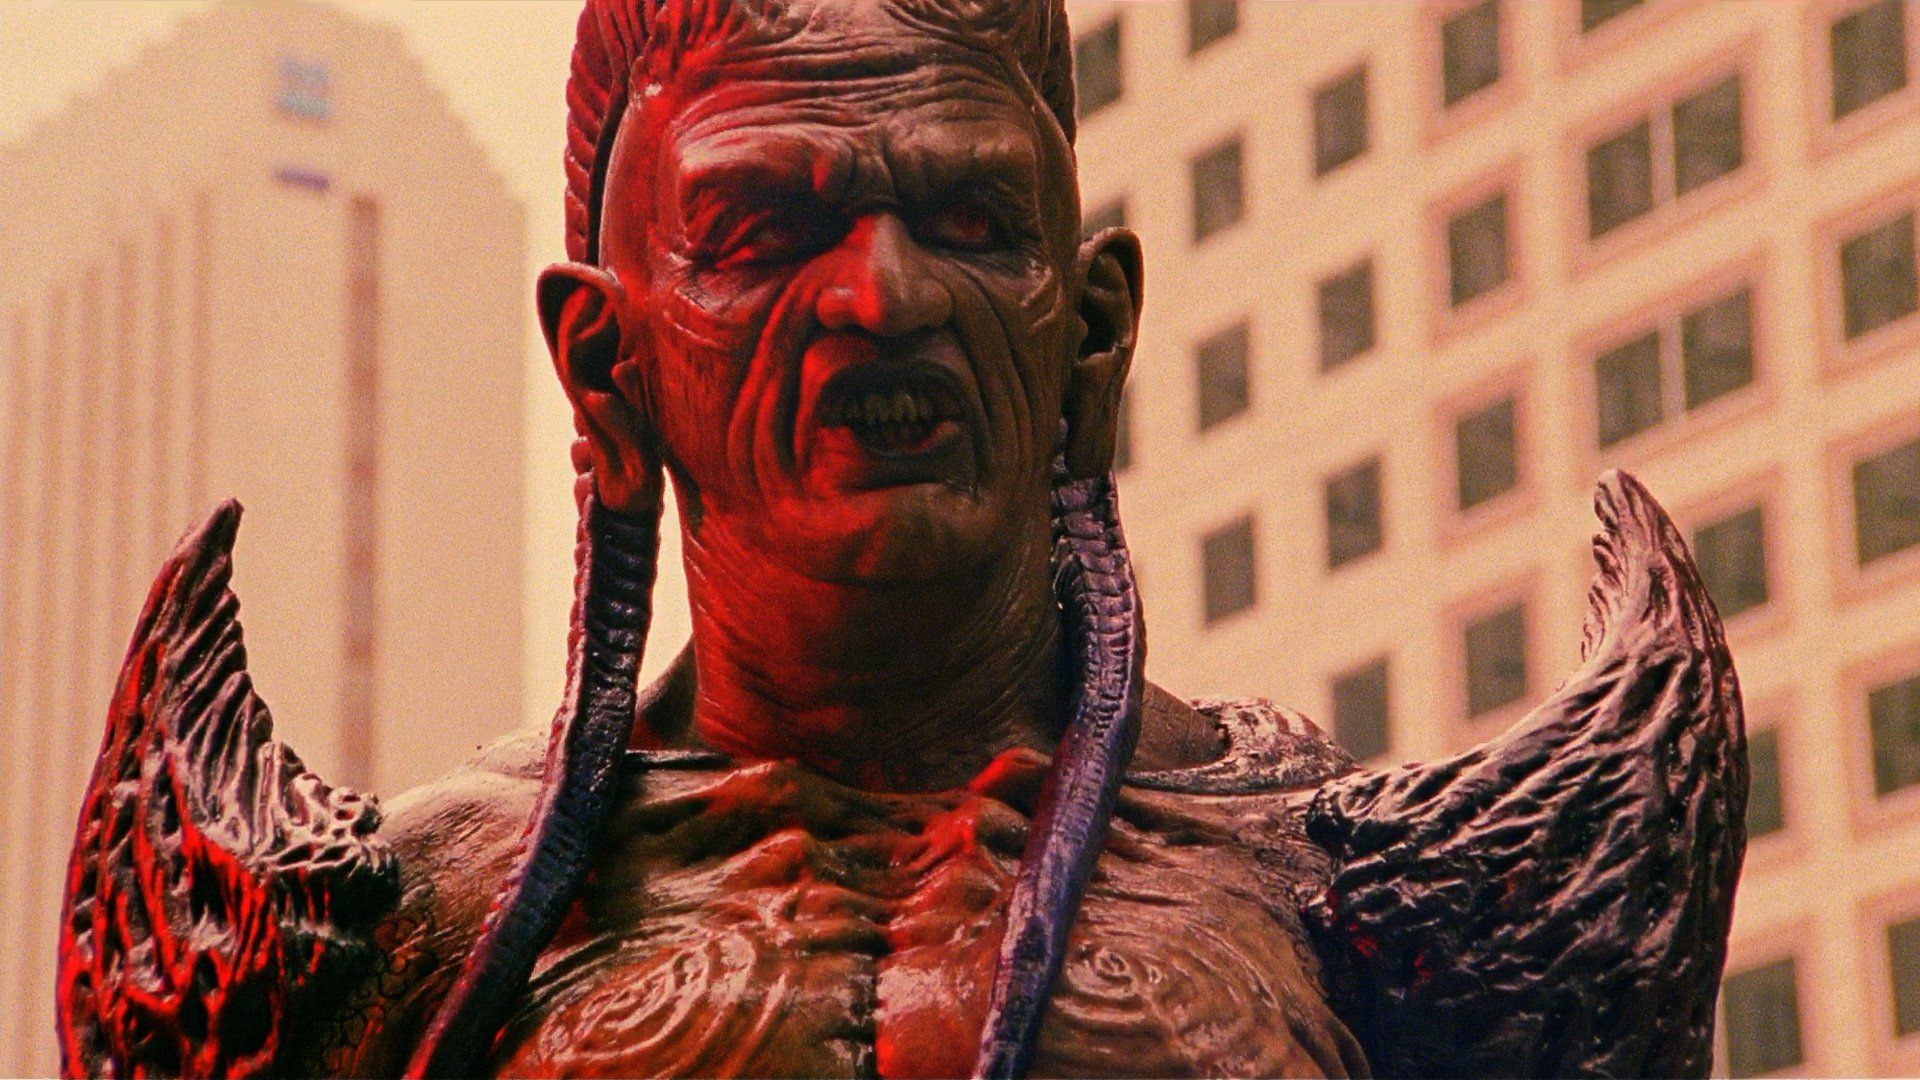 The Djinn (John Novak) in Wishmaster 4: The Prophecy Fulfilled (2002)